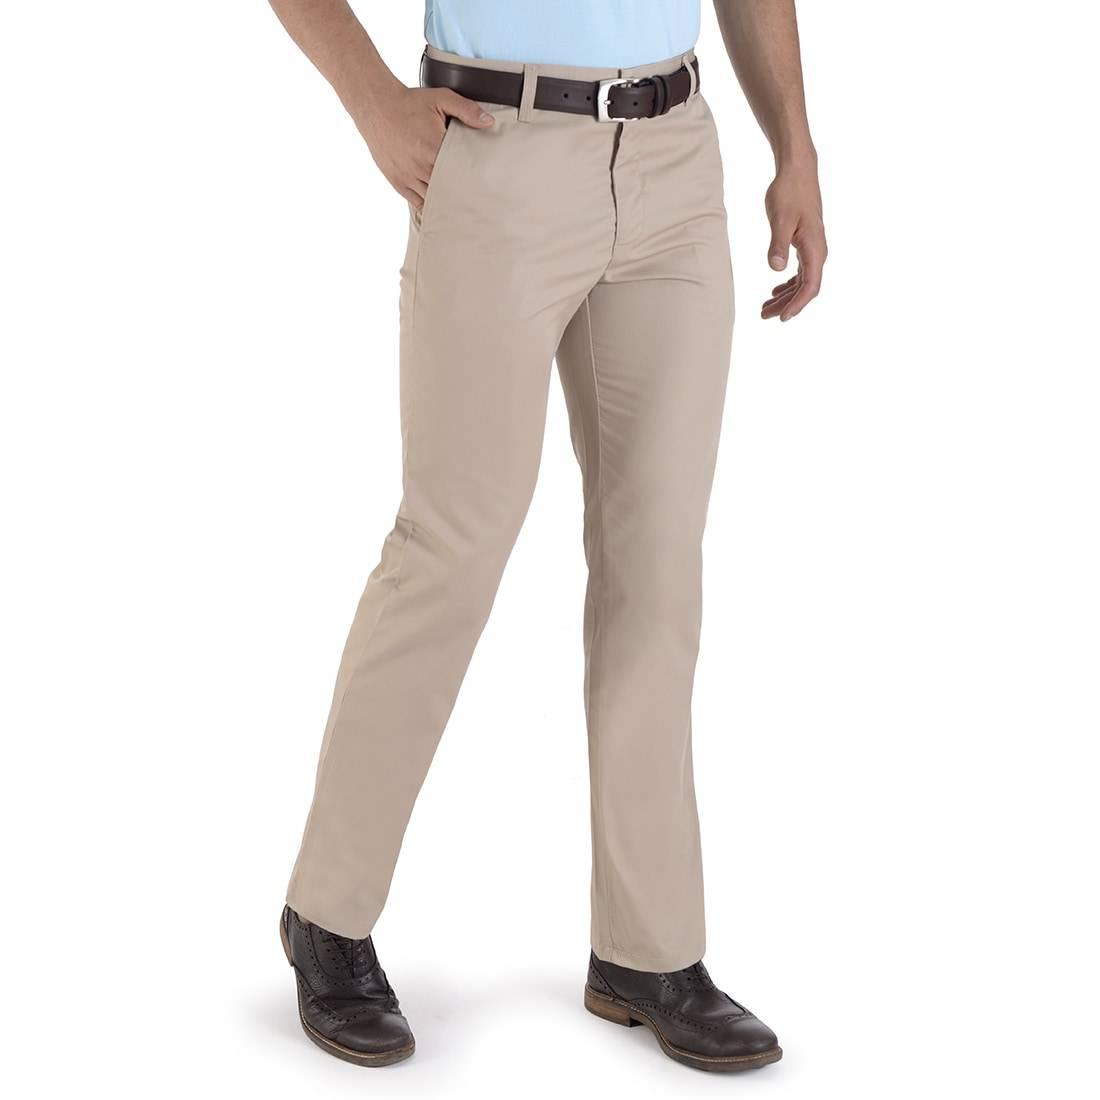 010920418961-01-Pantalon-Casual-Slim-Fit-Beige-yale